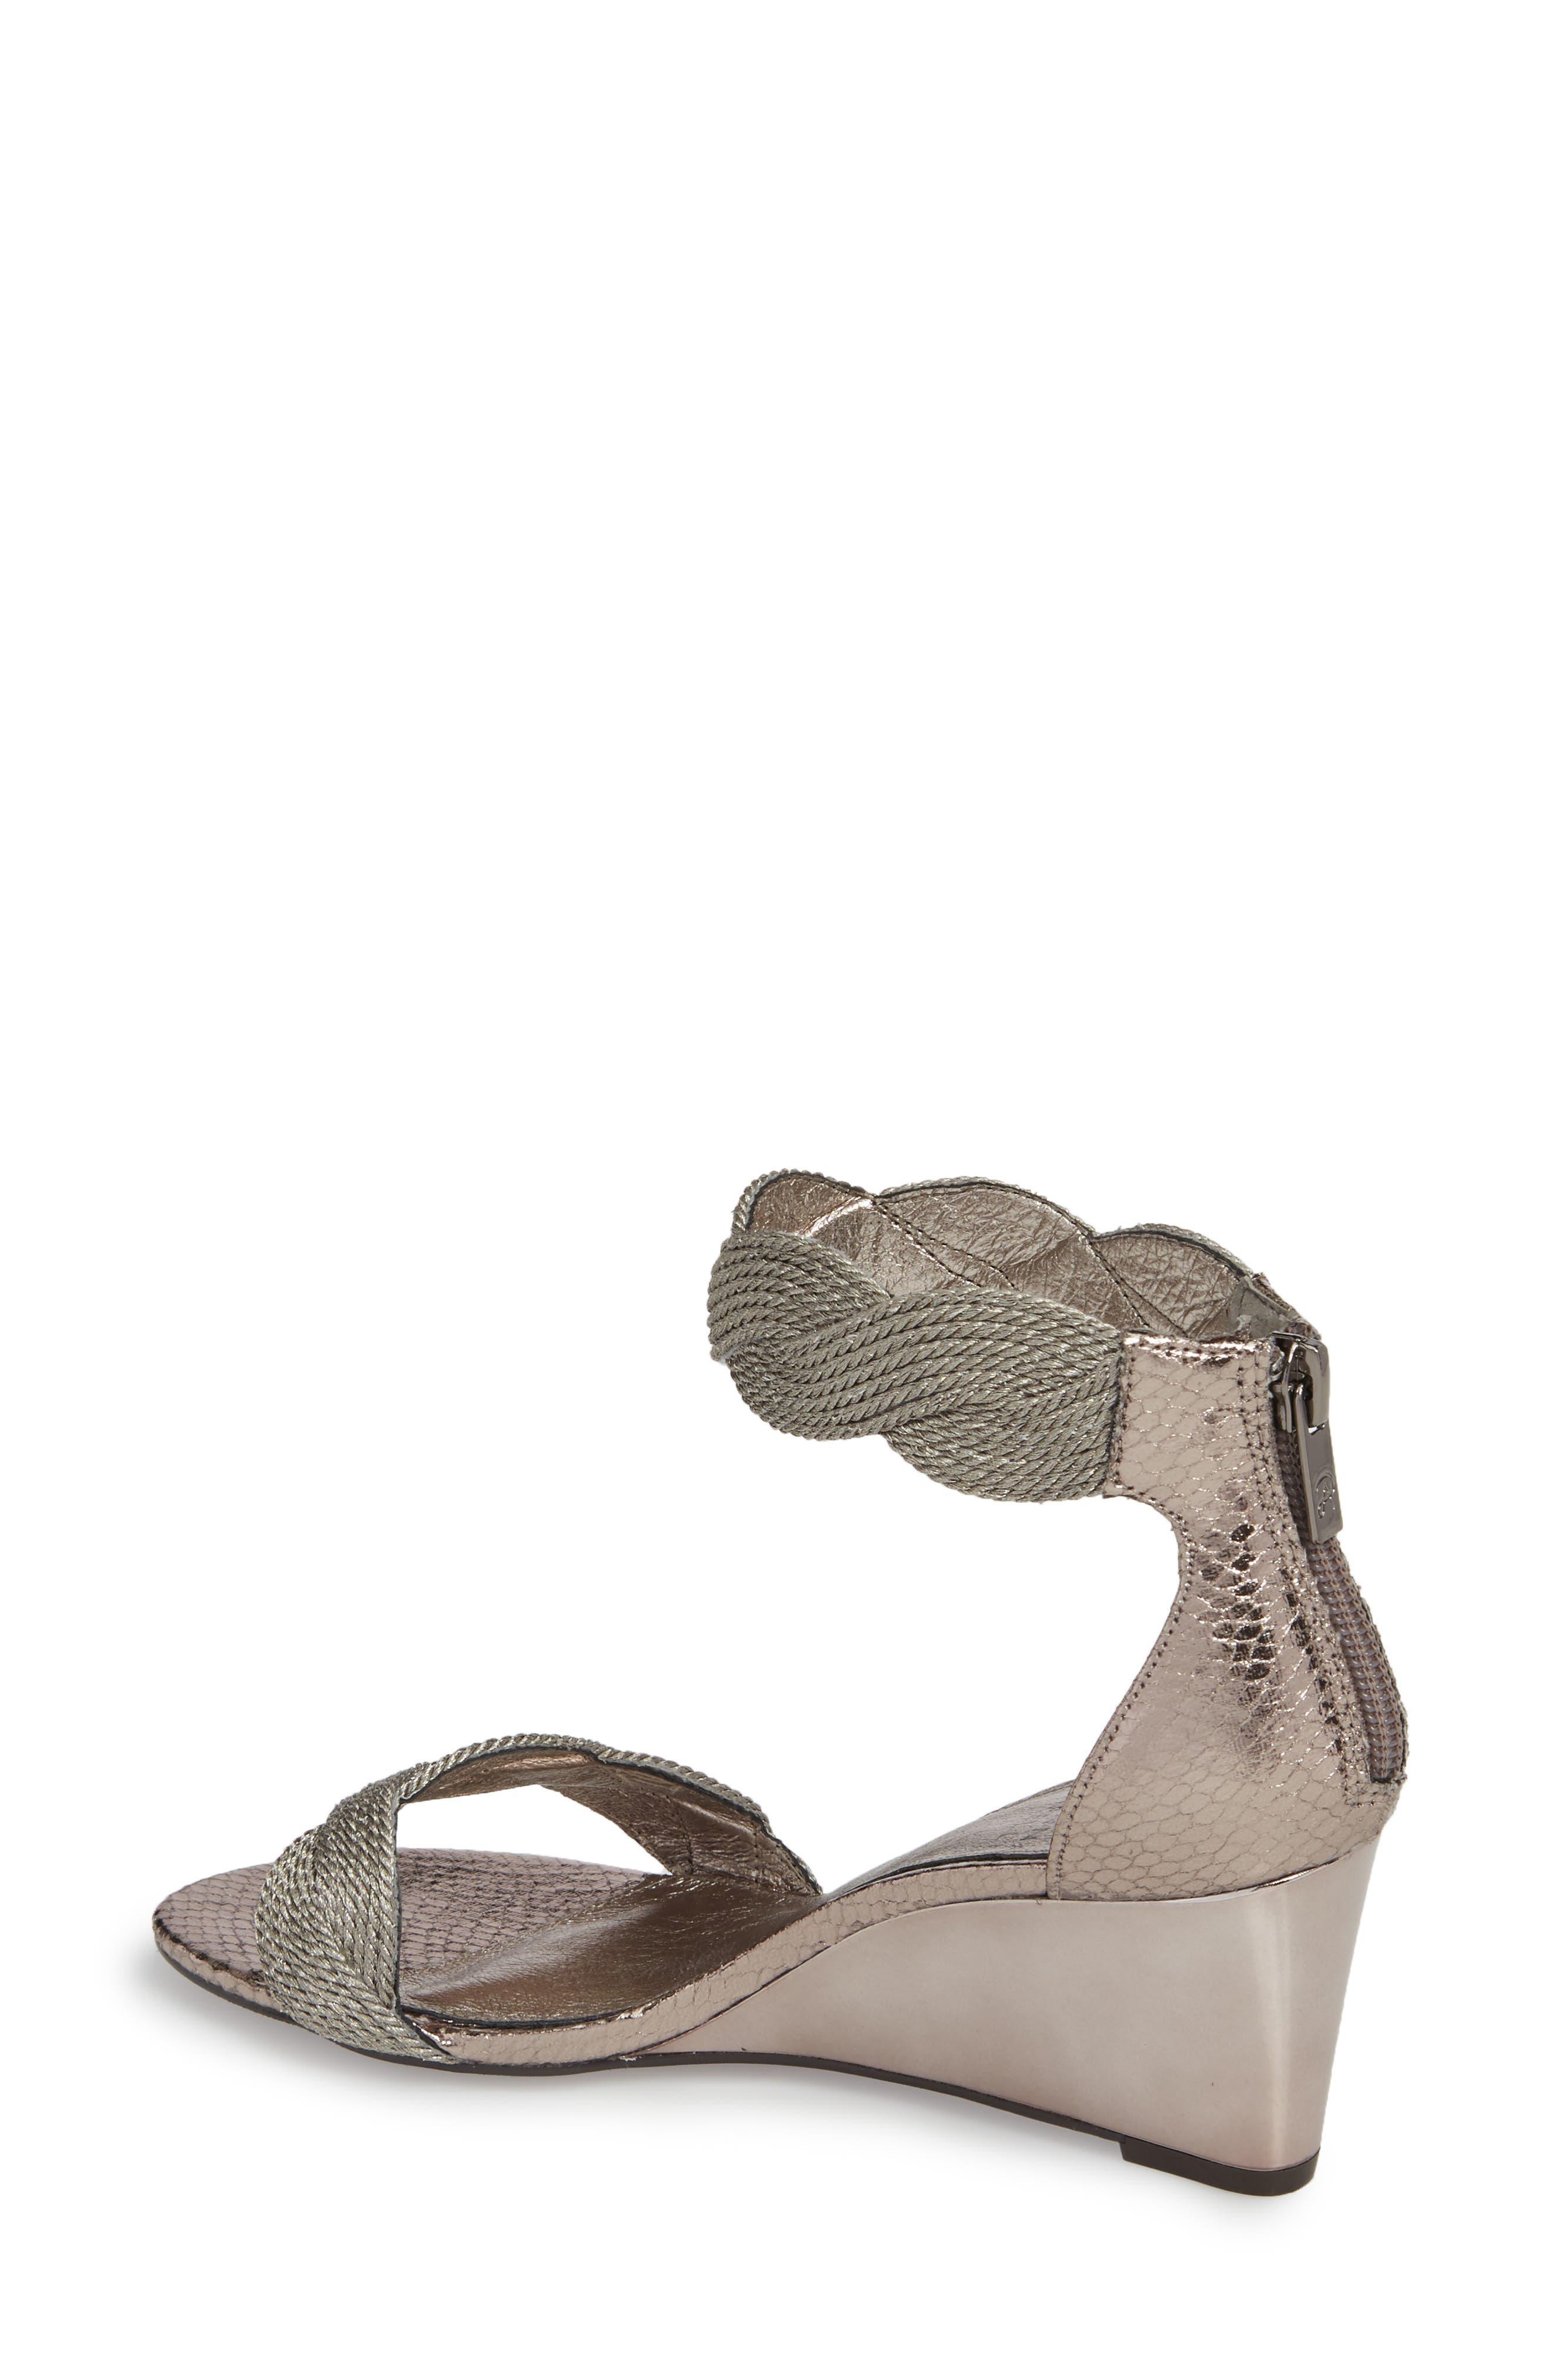 Adore Ankle Strap Sandal,                             Alternate thumbnail 2, color,                             GUNMETAL FABRIC